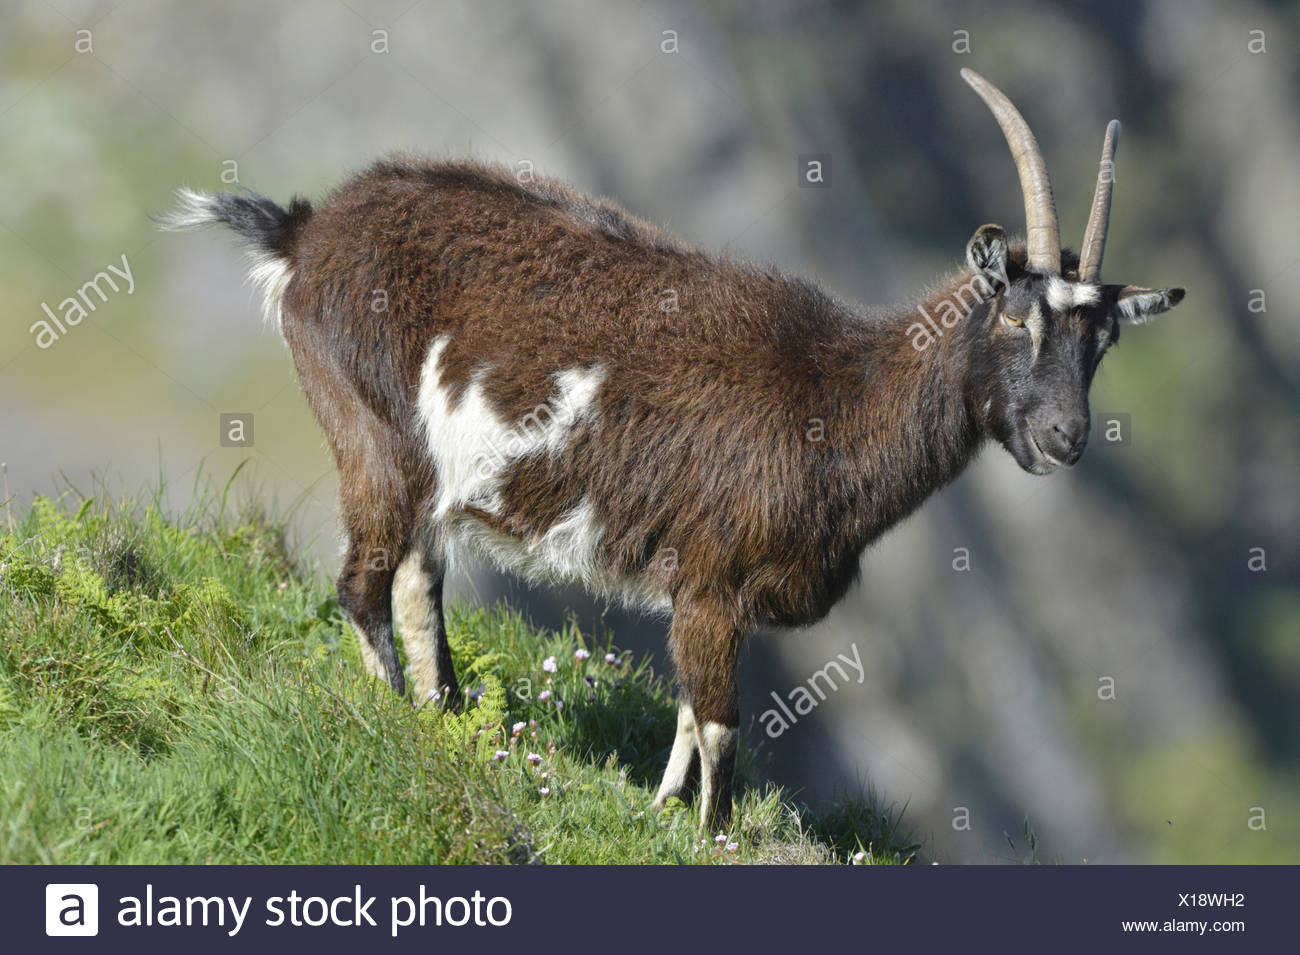 Ziege - Capra hircus Stockfoto